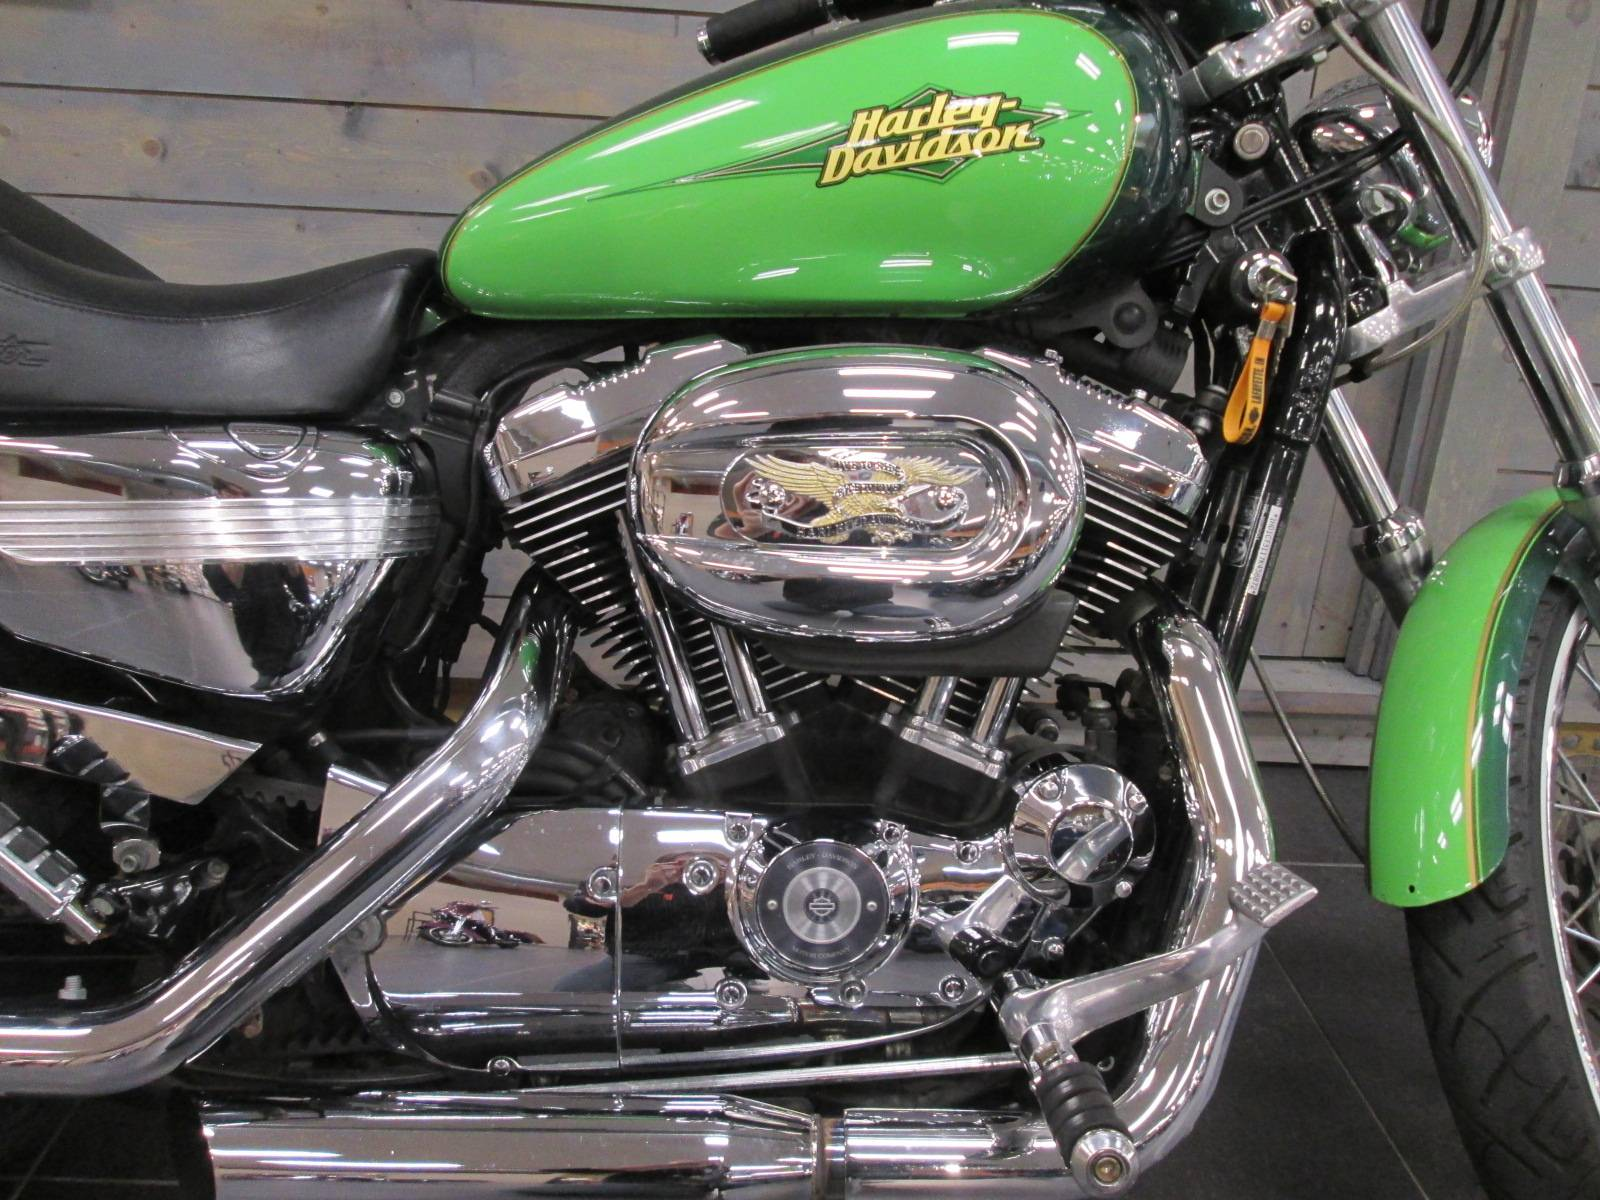 Used 2007 Harley Davidson Sportster 1200 Custom Motorcycles In Kokomo In K458872 Two Tone Dark Green Envy Pearl Light Green Envy